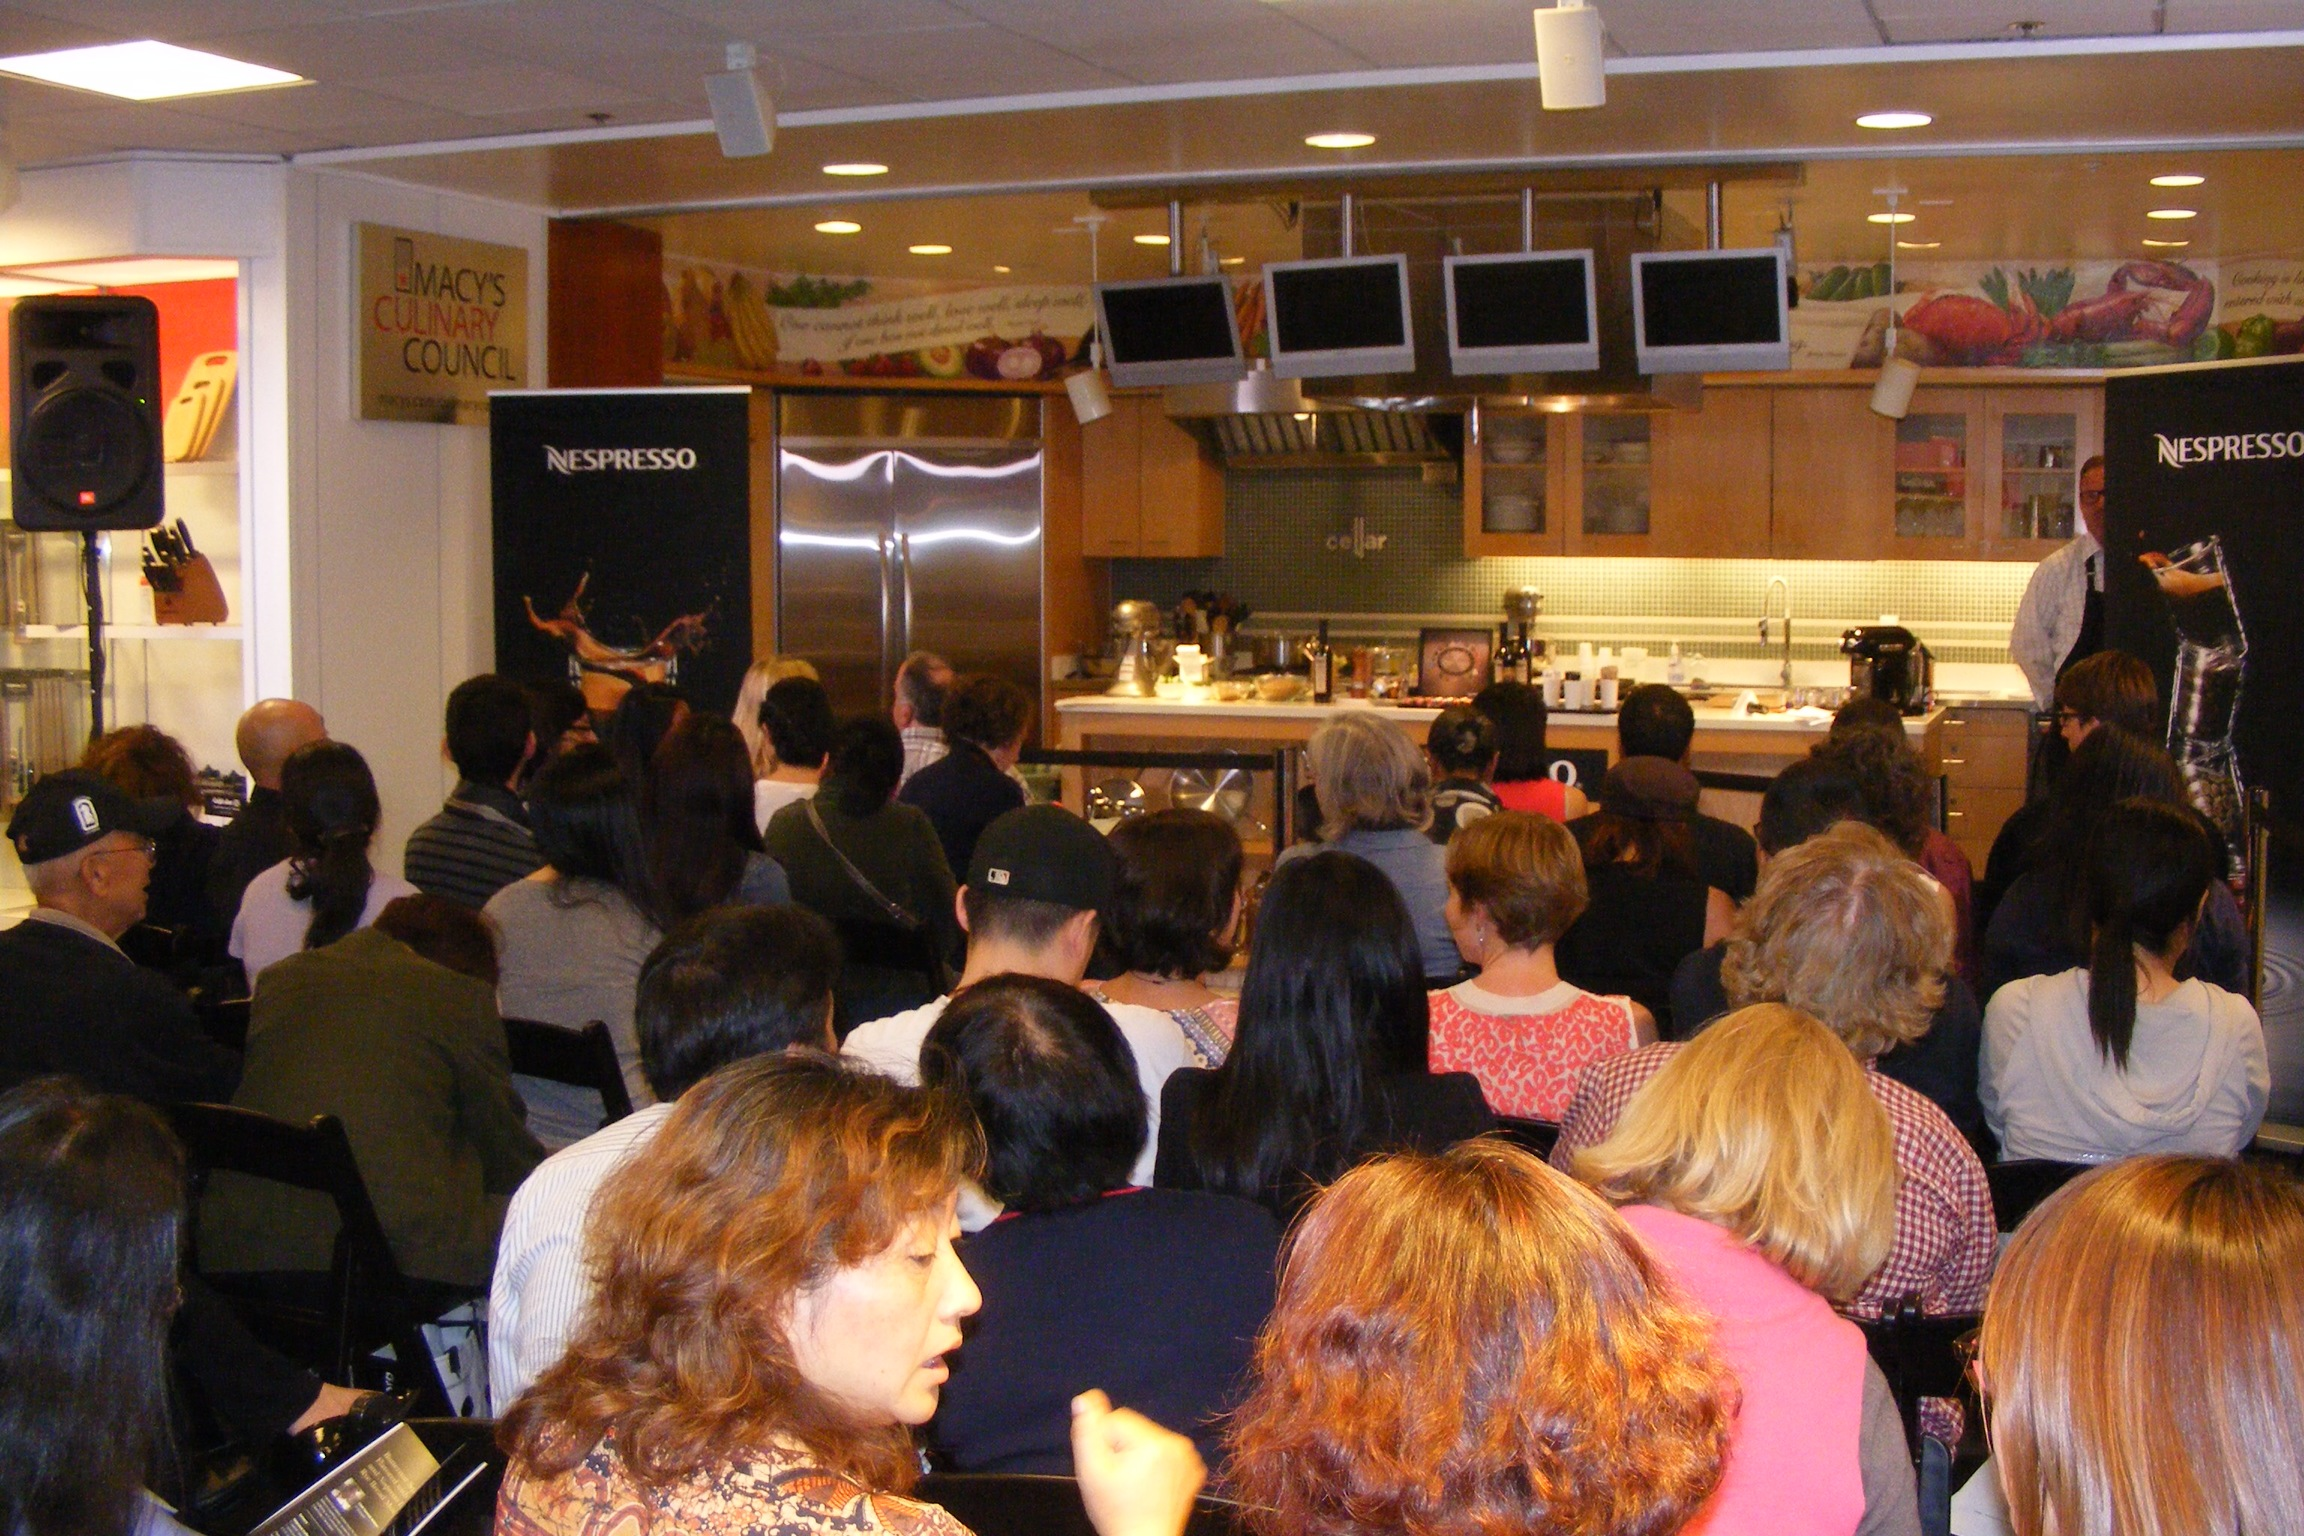 Macys Culinary Council Nespresso ClassyBlackGirl